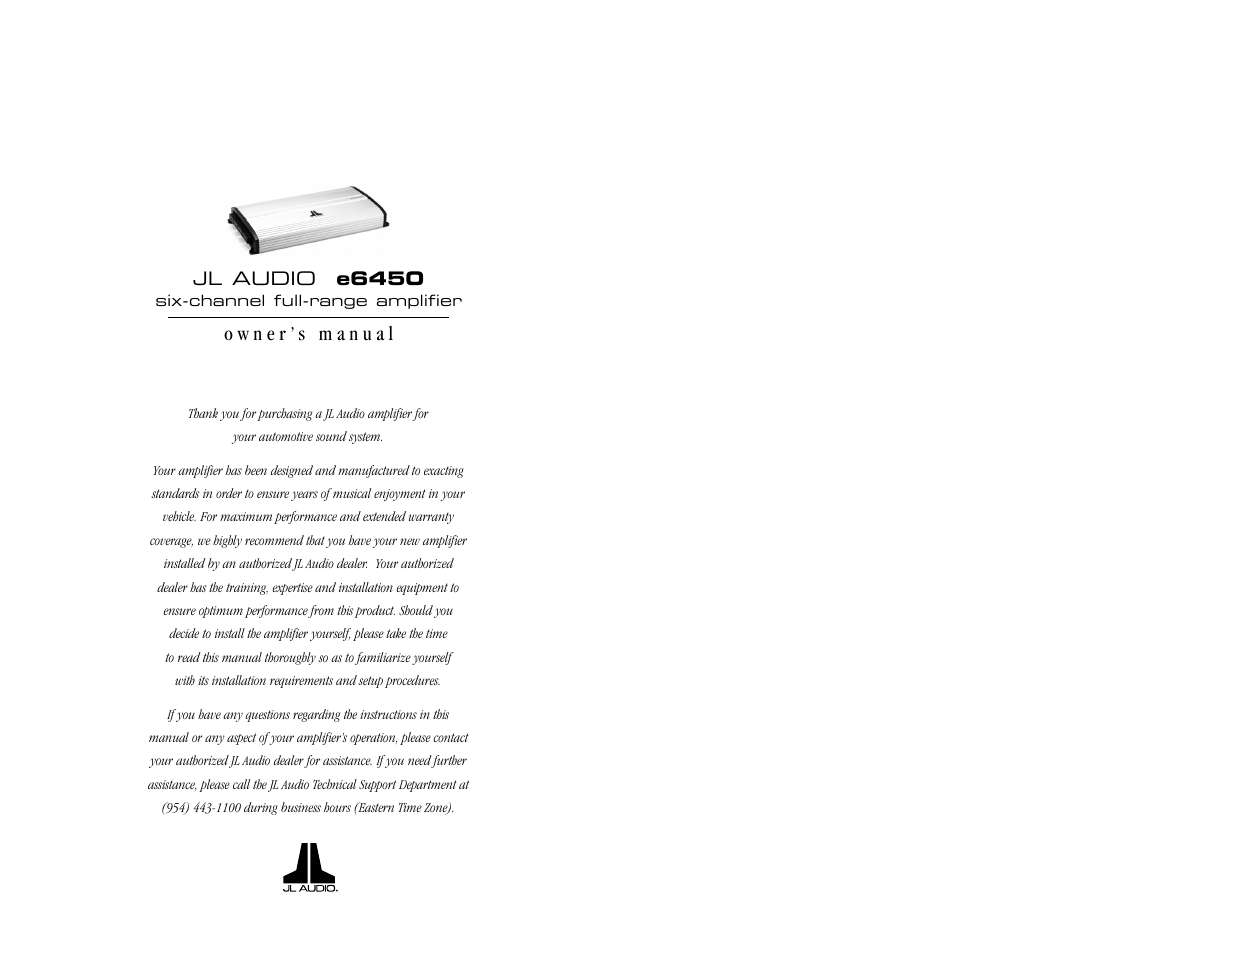 jl audio e6450 user manual 11 pages rh manualsdir com